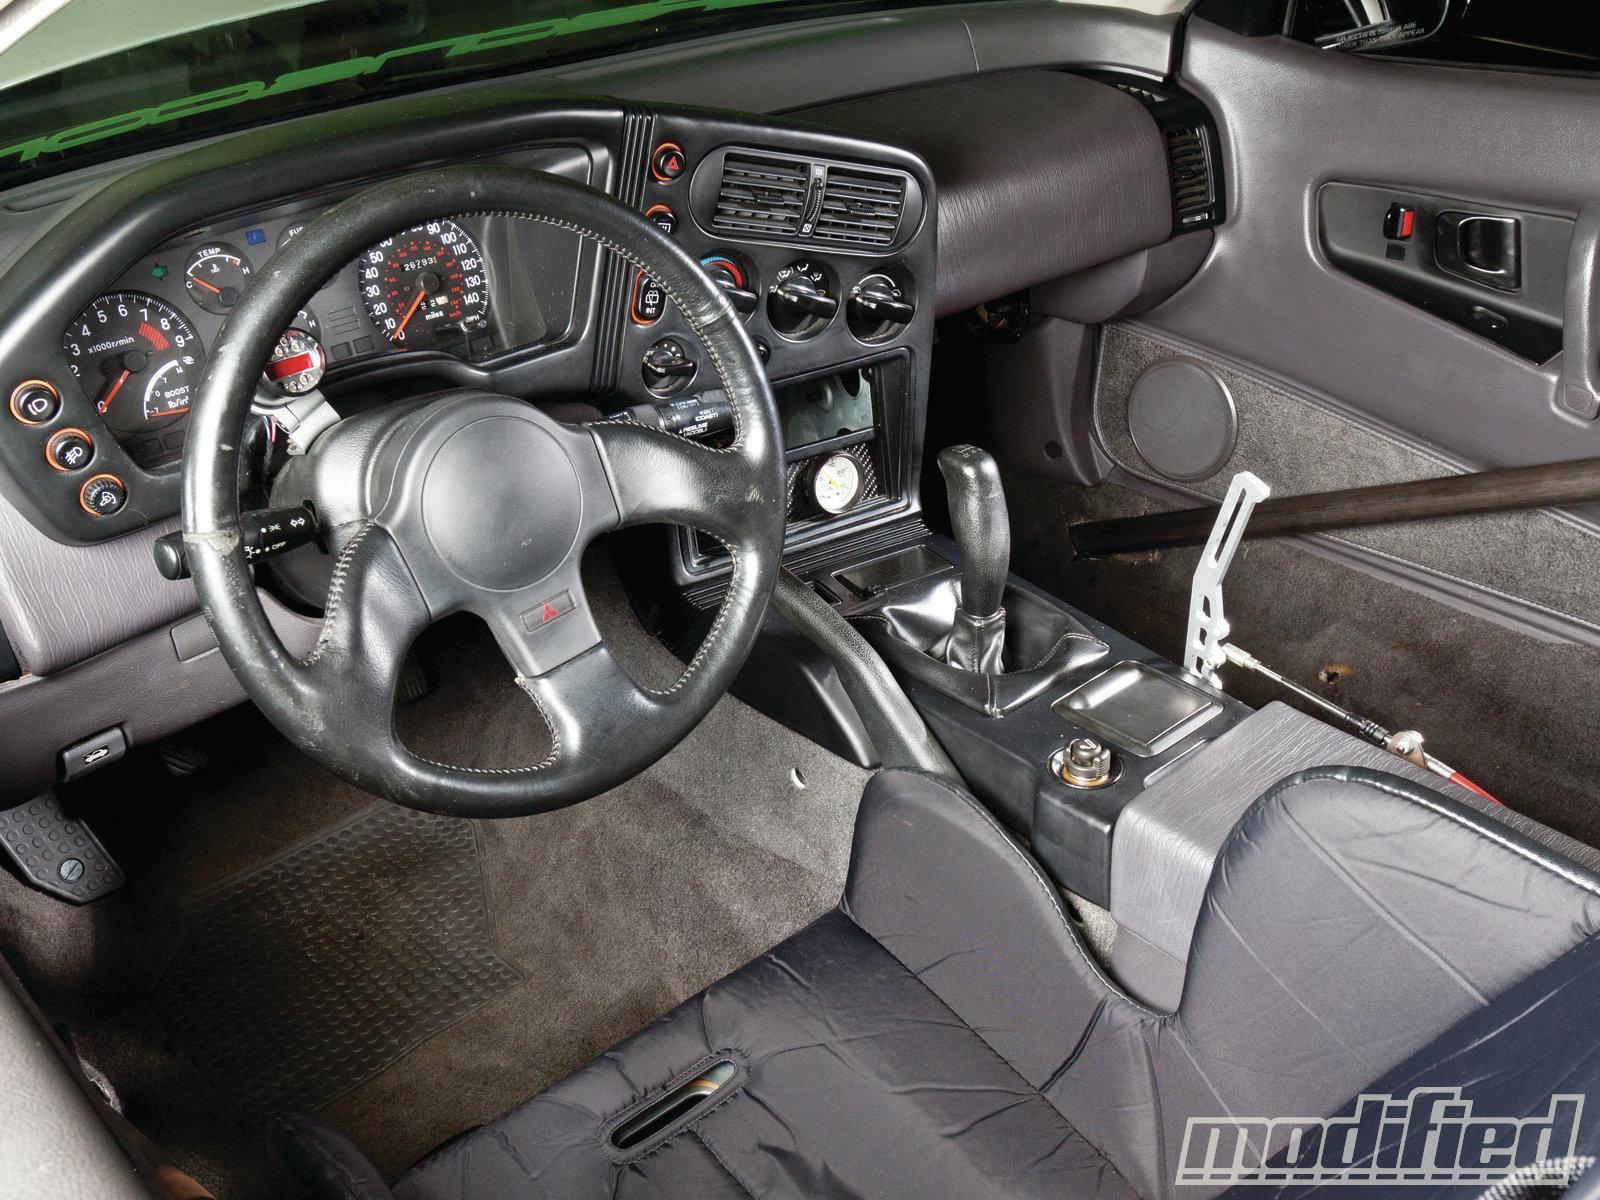 1991 Mitsubishi Eclipse - Information and photos - Zomb Drive